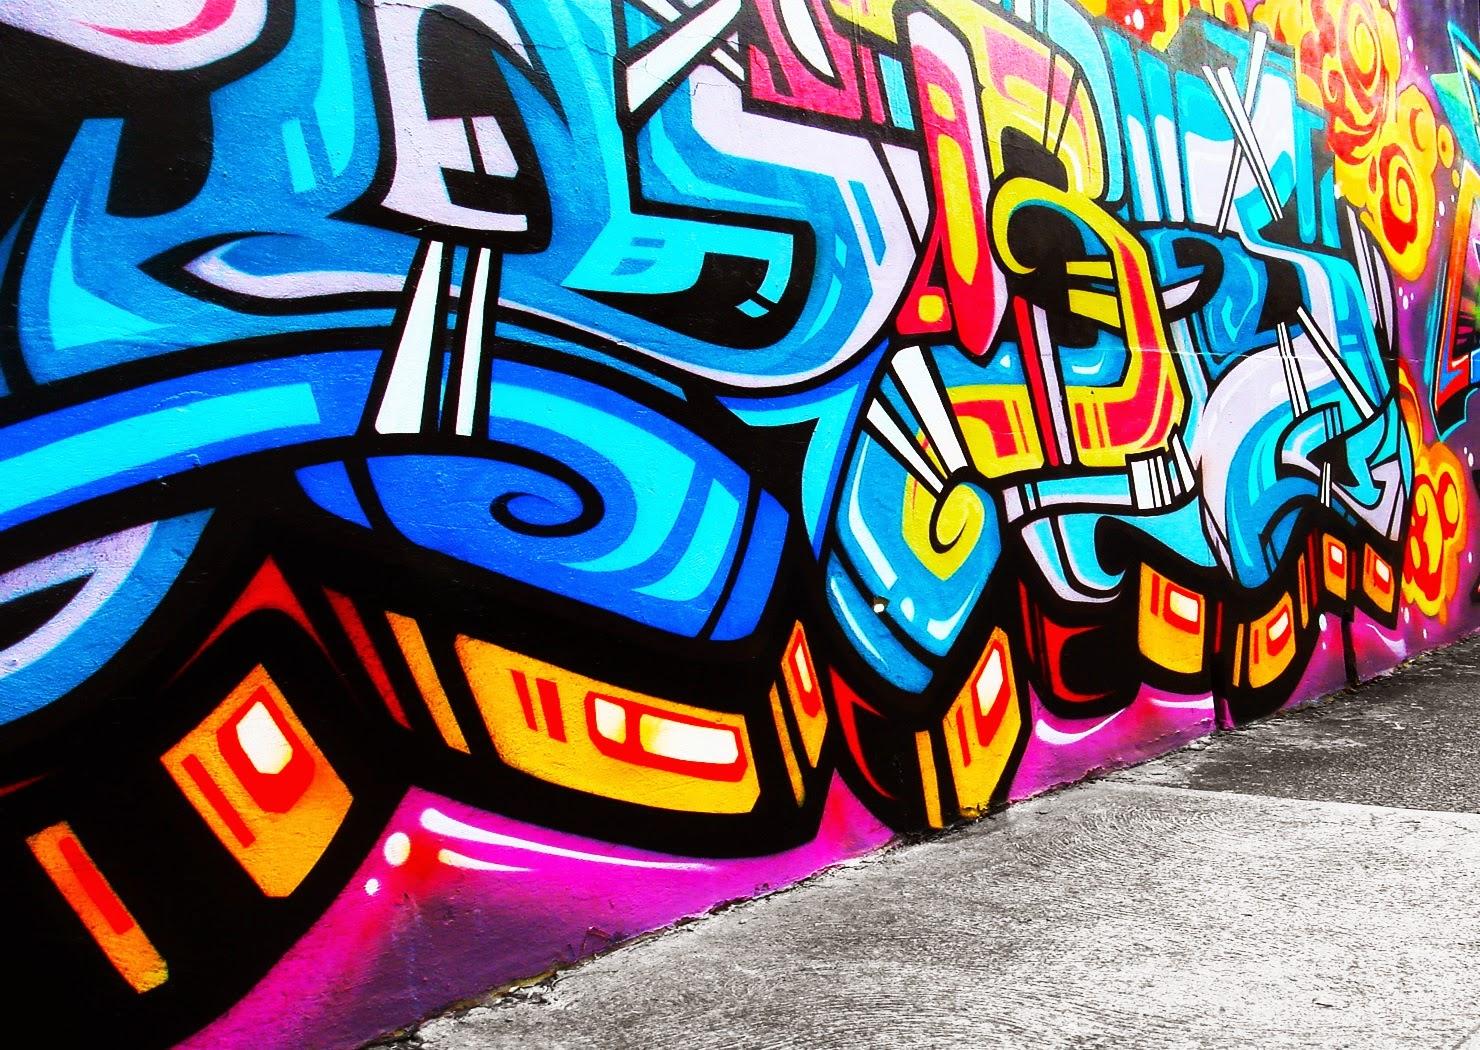 Graffiti event και μουσικό live στο Πανεπιστήμιο Πατρών